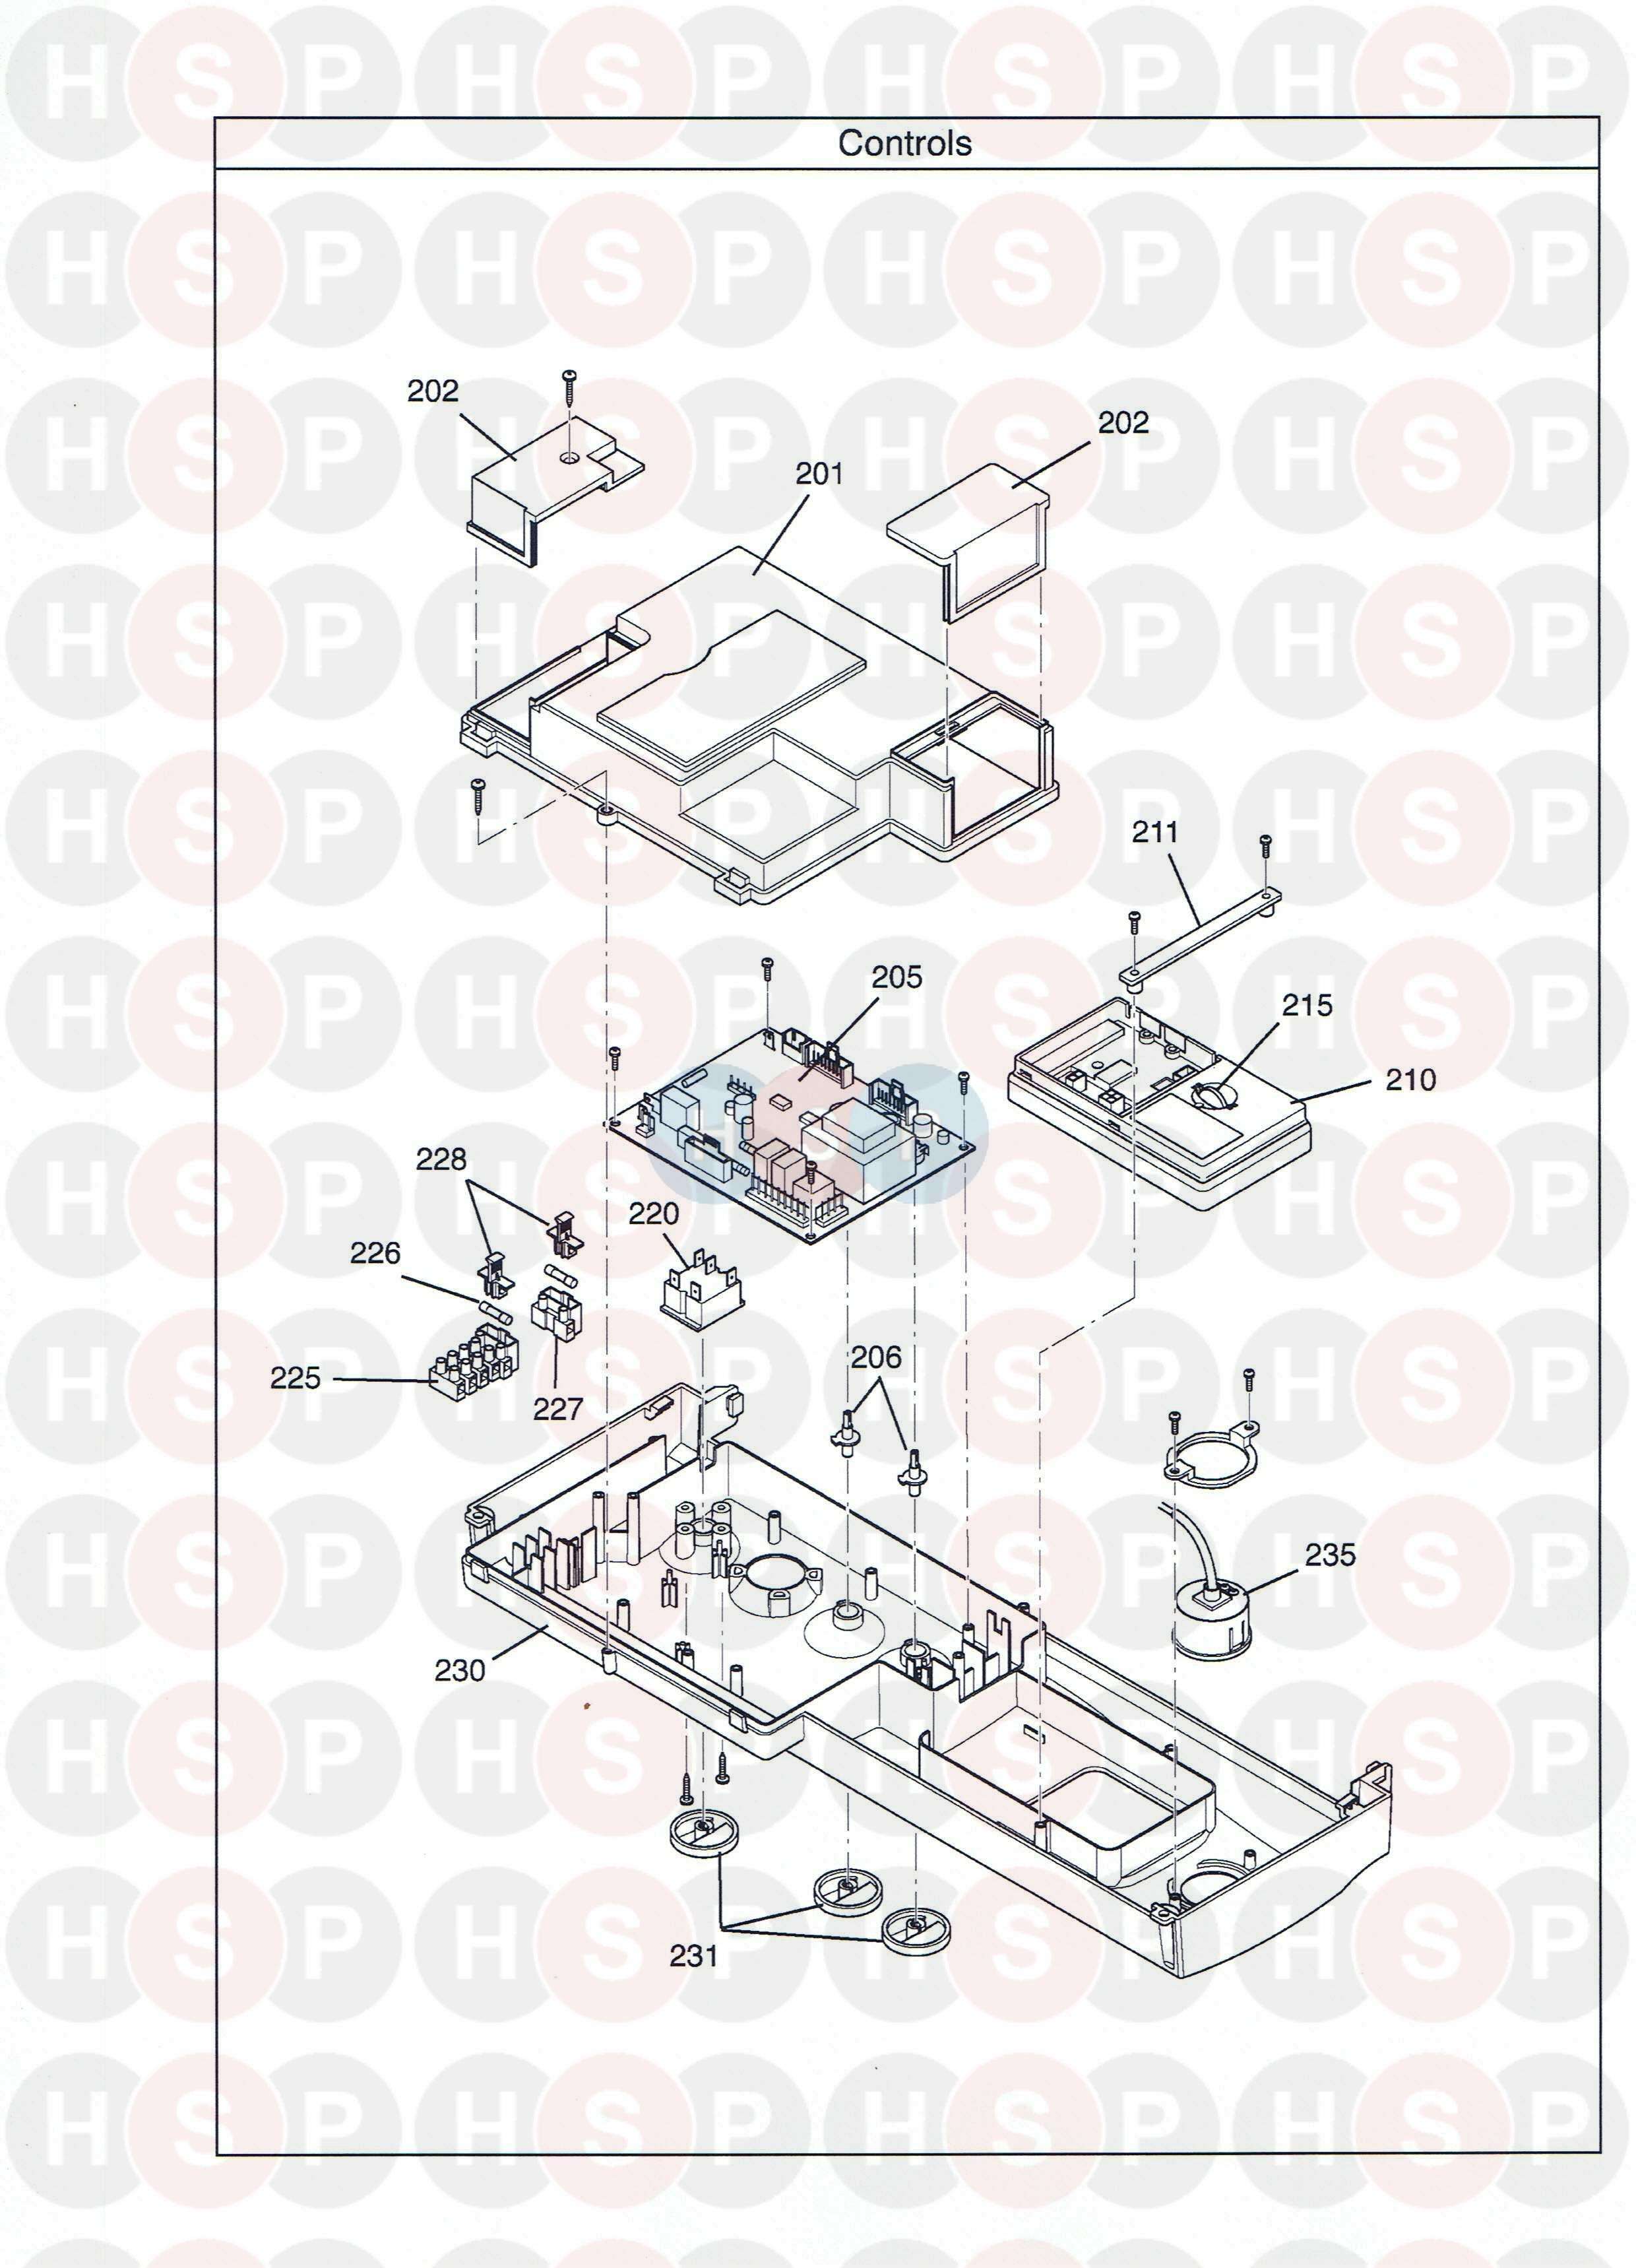 Potterton PROMAX HE STORE 90 LITRE (Controls) Diagram